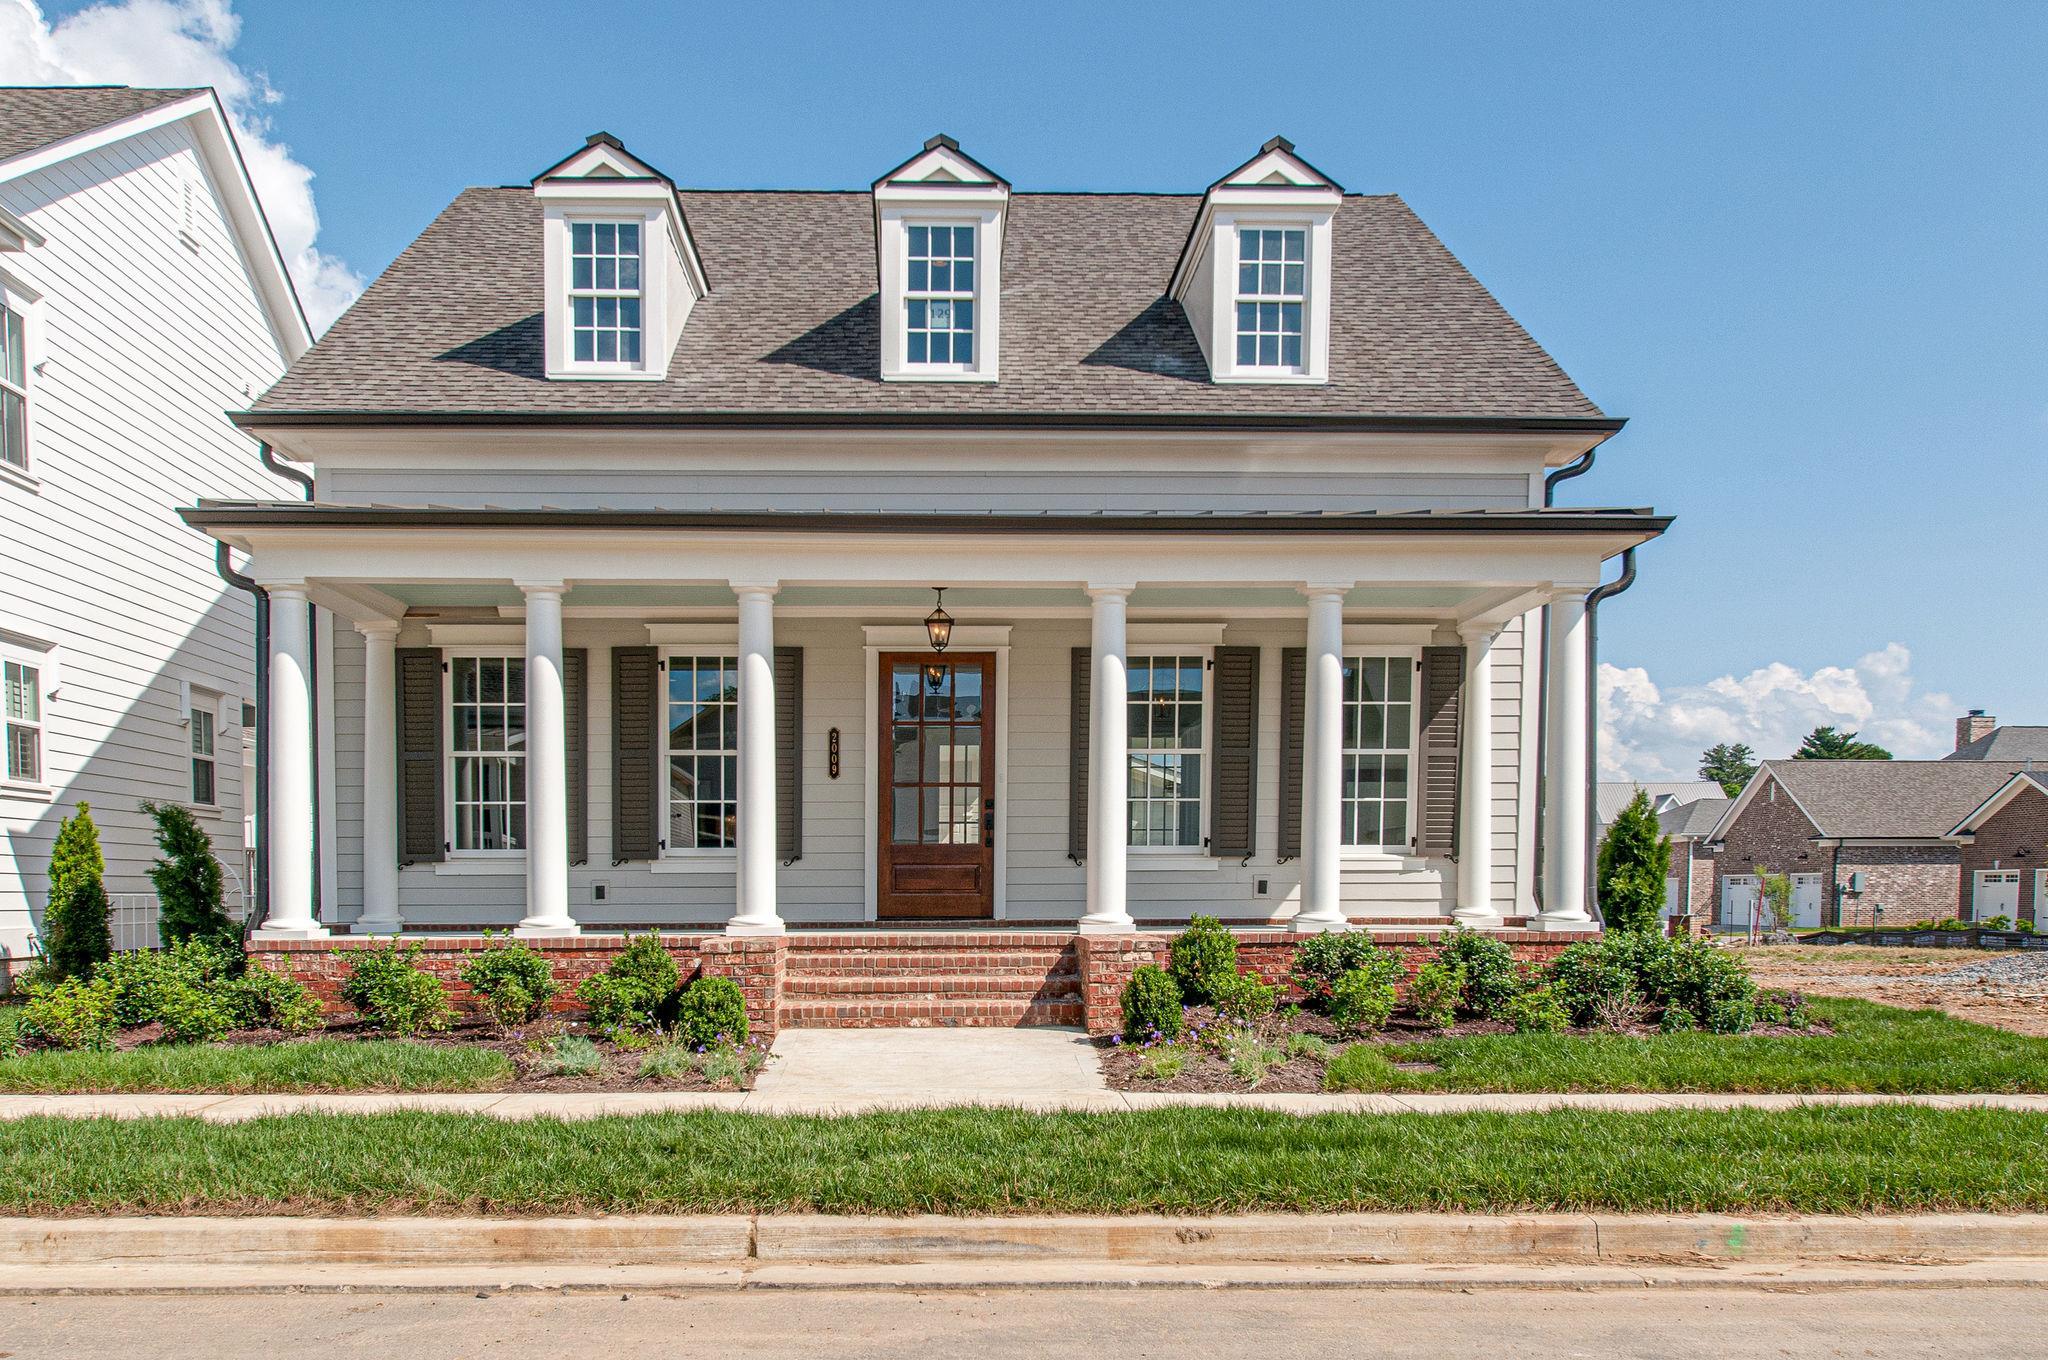 2009 Garfield Street- Lot 129, Nashville, TN 37221 - Nashville, TN real estate listing